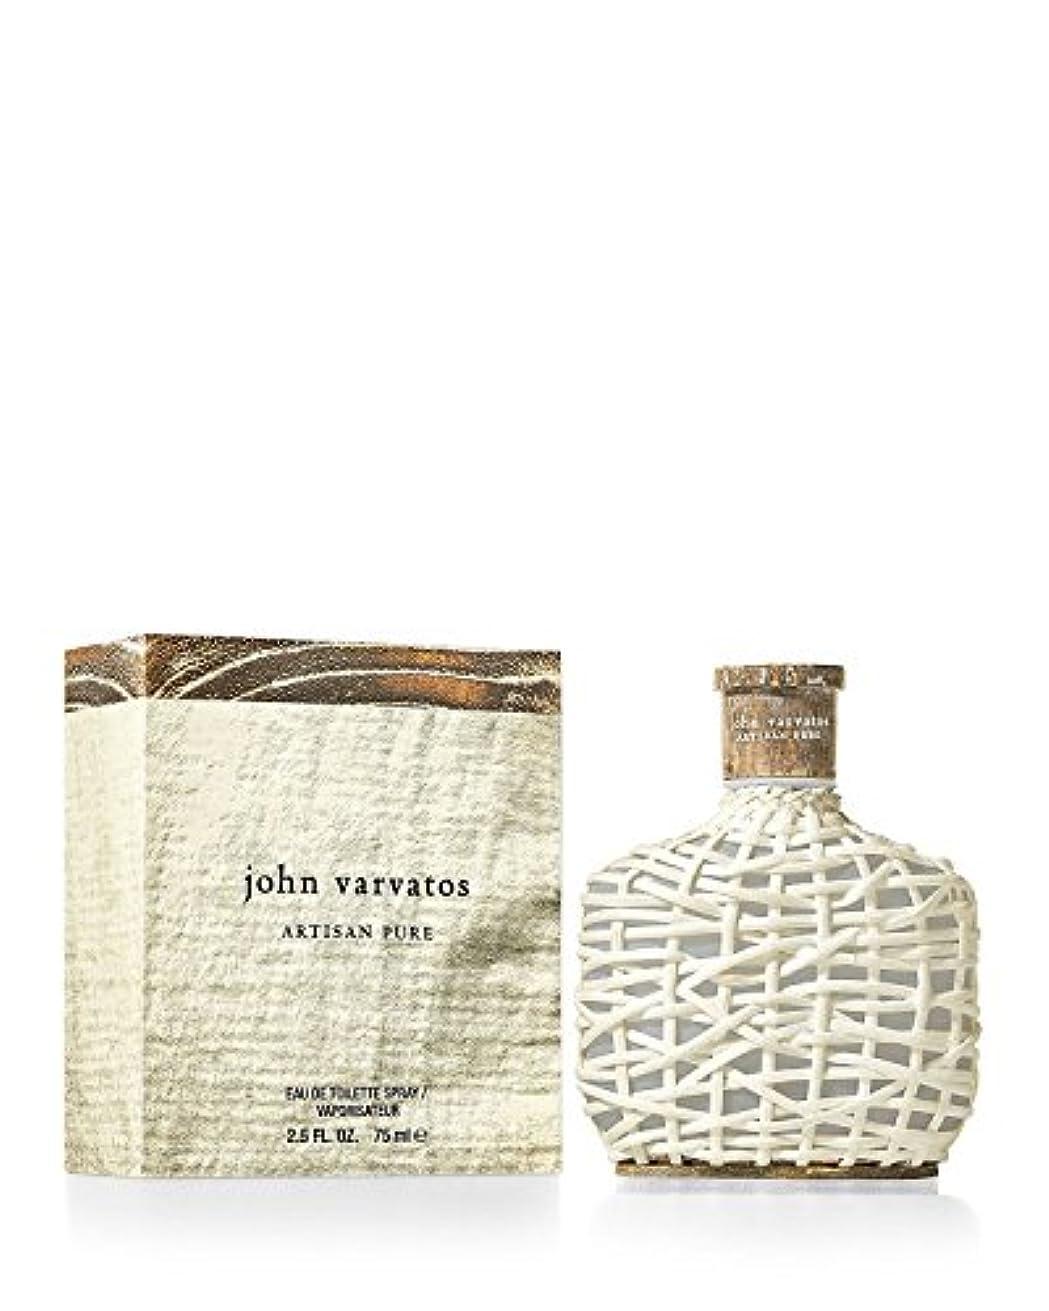 John Varvatos Artisan Pure(ジョンバルバトス アルチザン ピュア) 4.2 oz (125ml) EDT Spray for Men